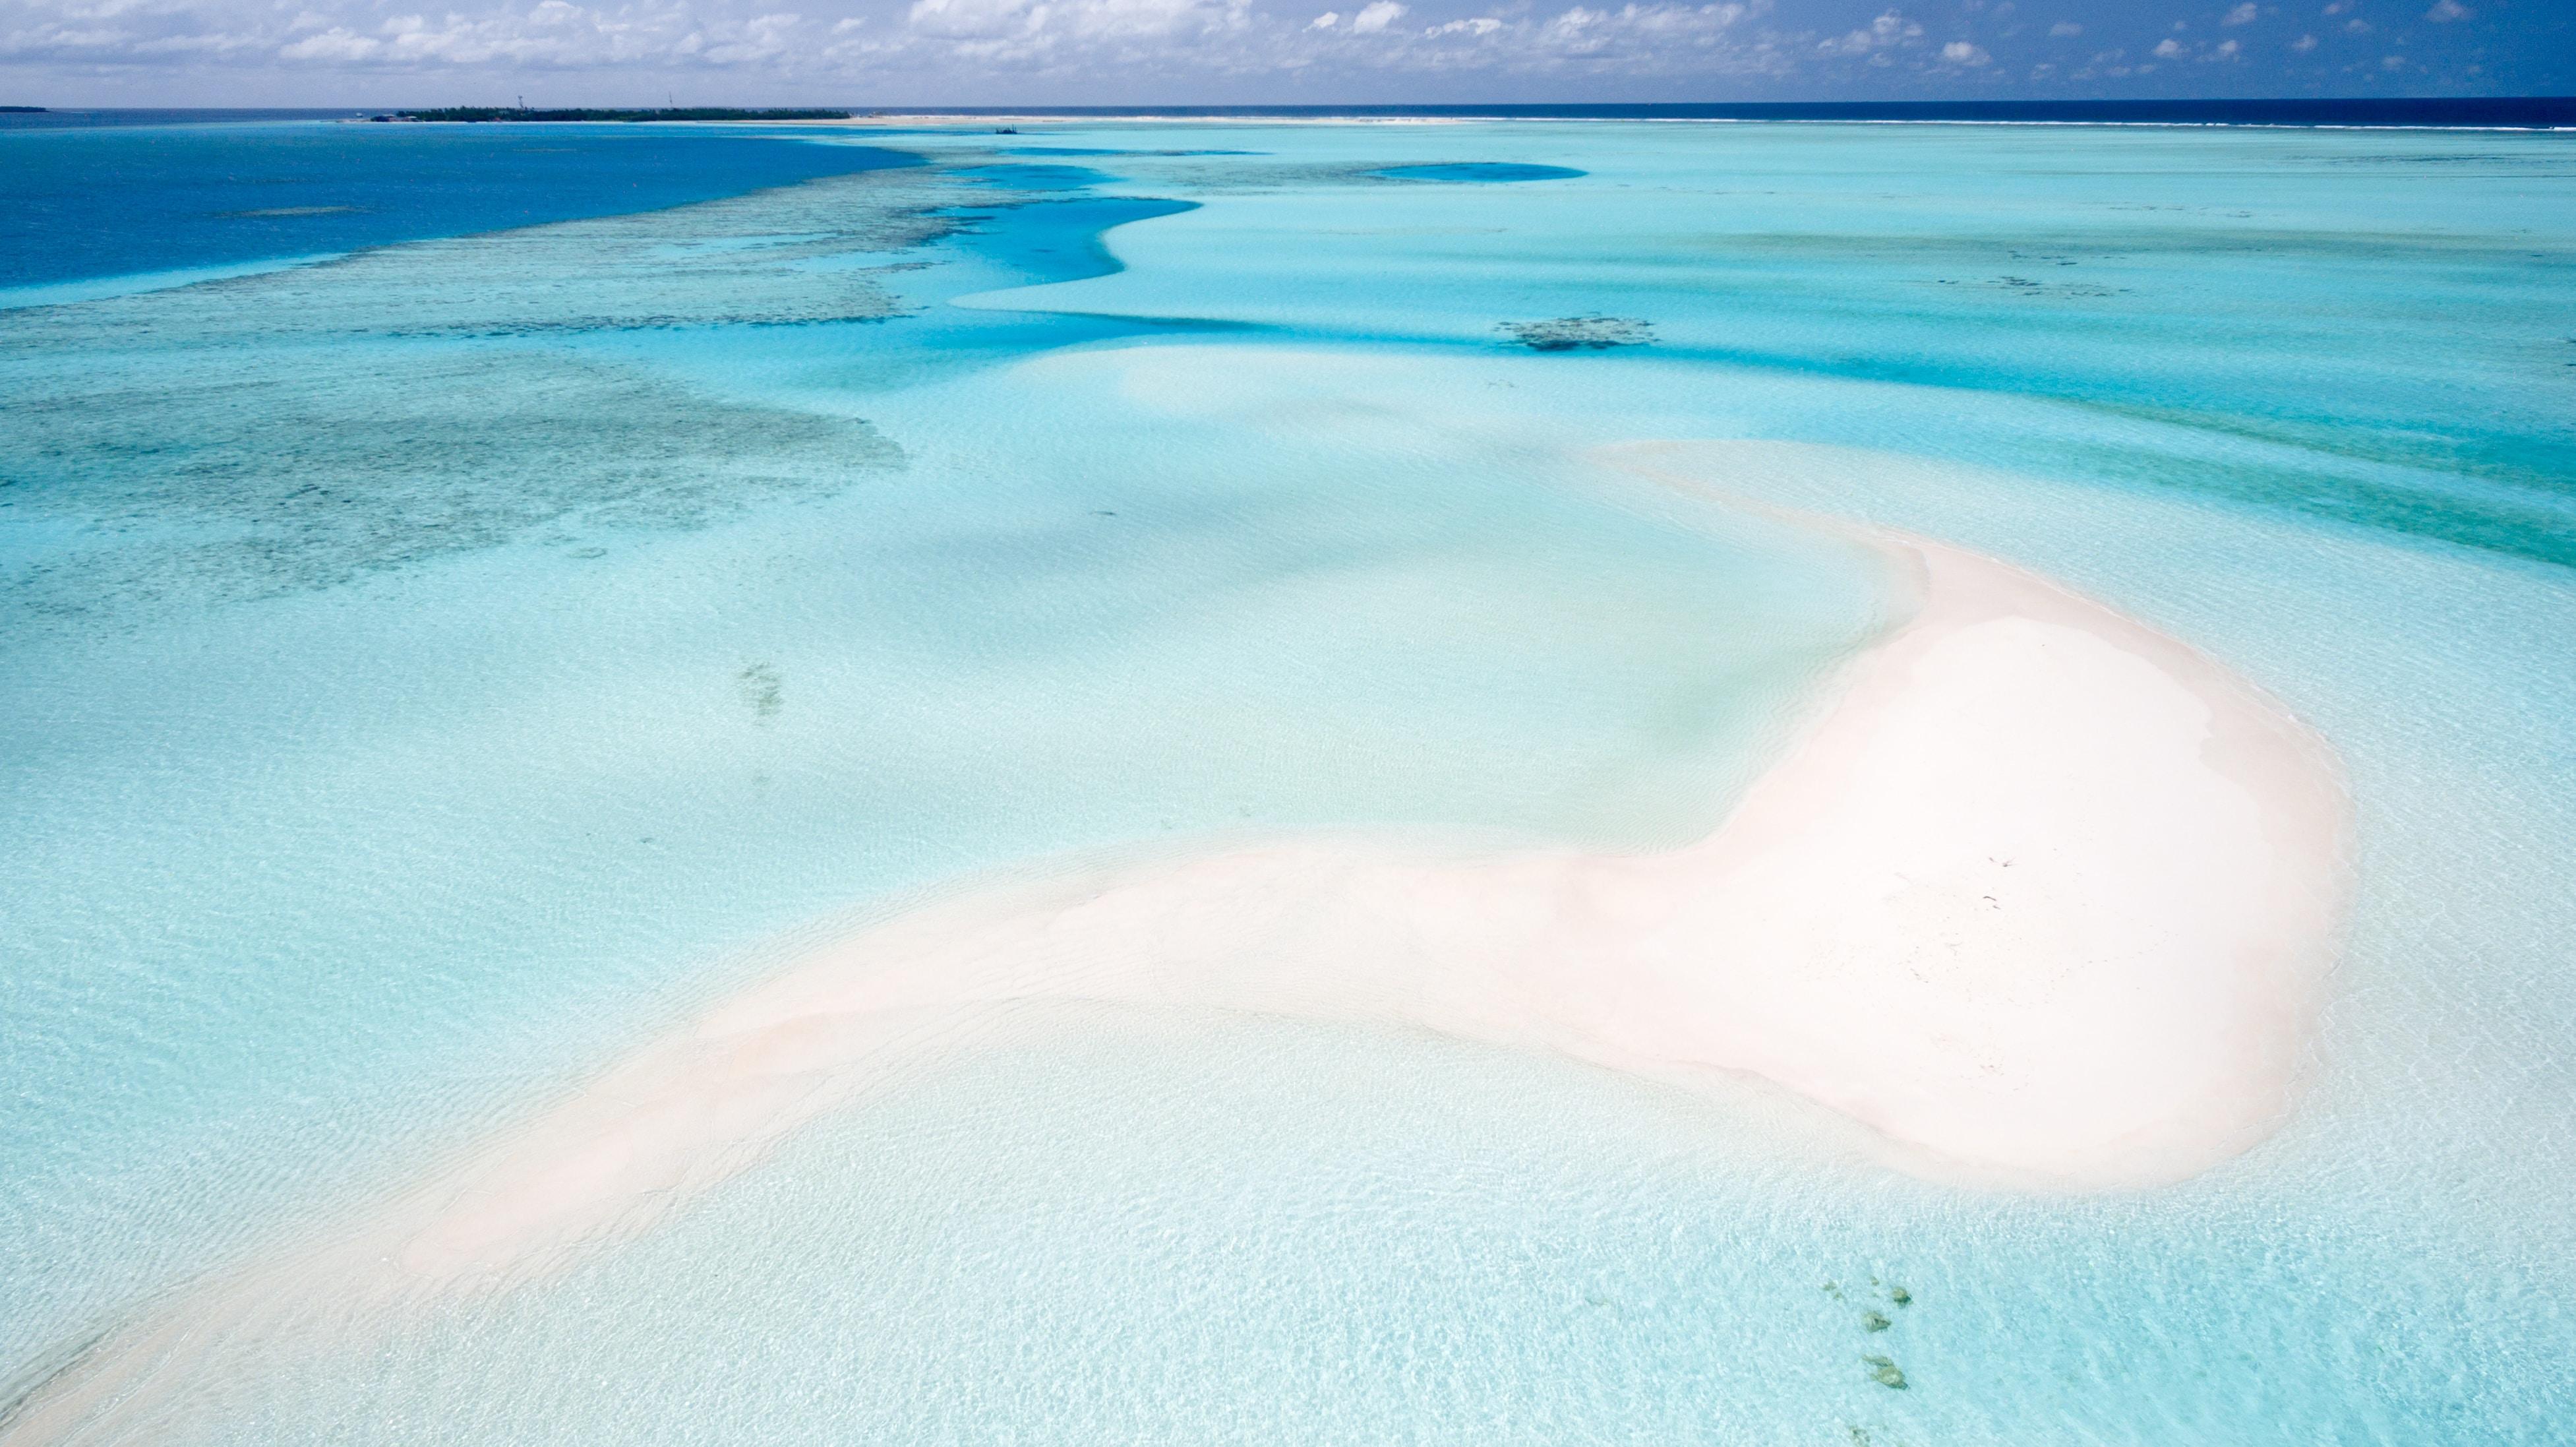 Coastal turquoise clear ocean at Dhaalu Atoll